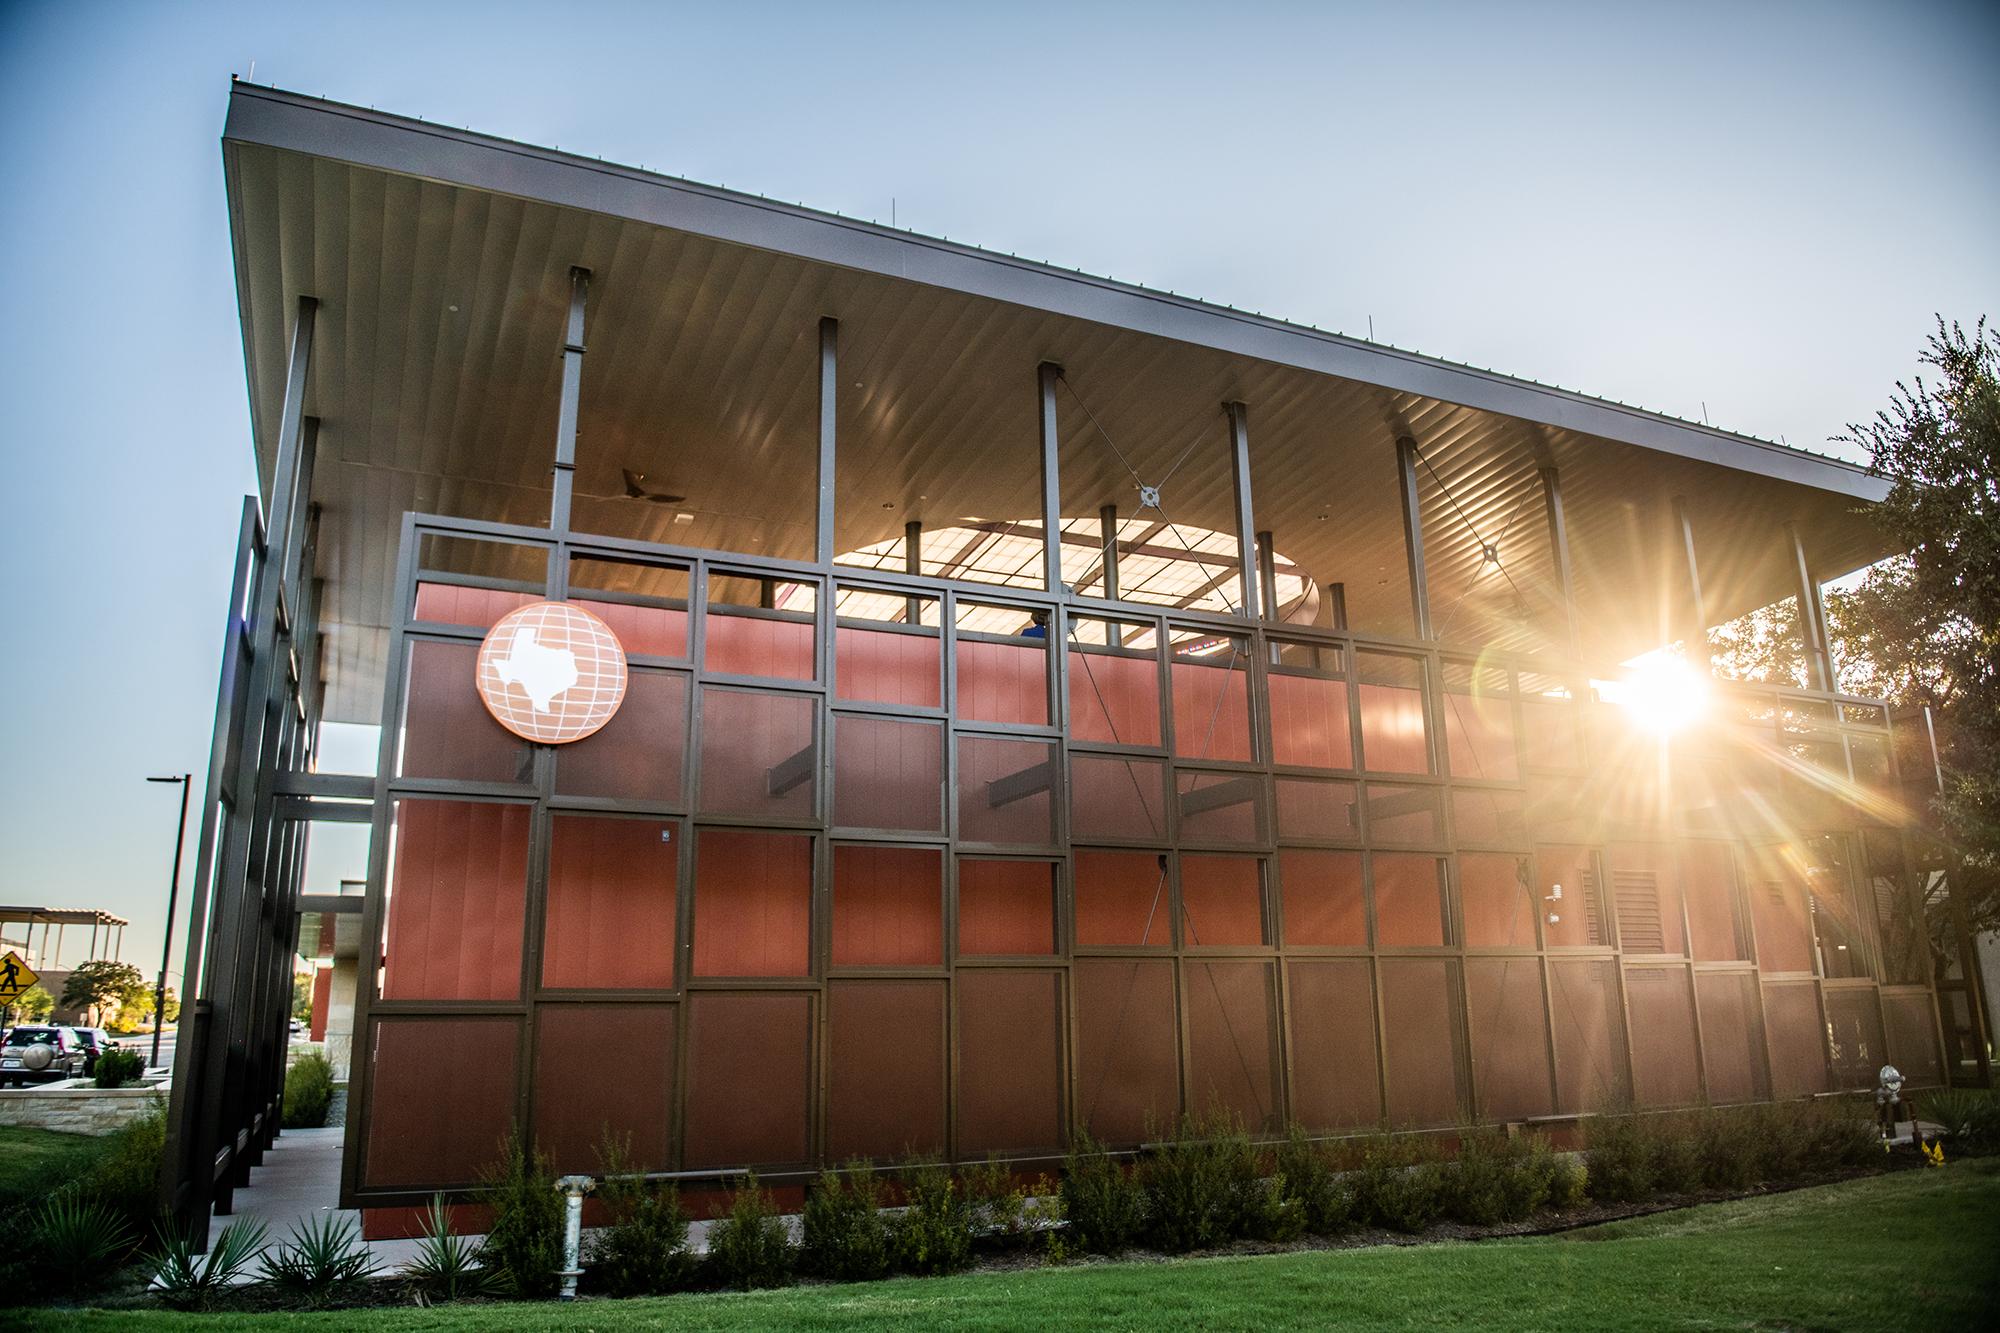 Bureau of Economic Geology Building